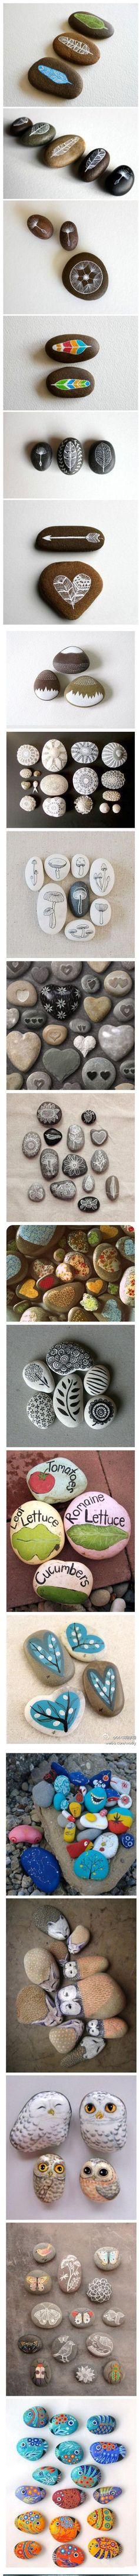 Pebble Art Creative Designs